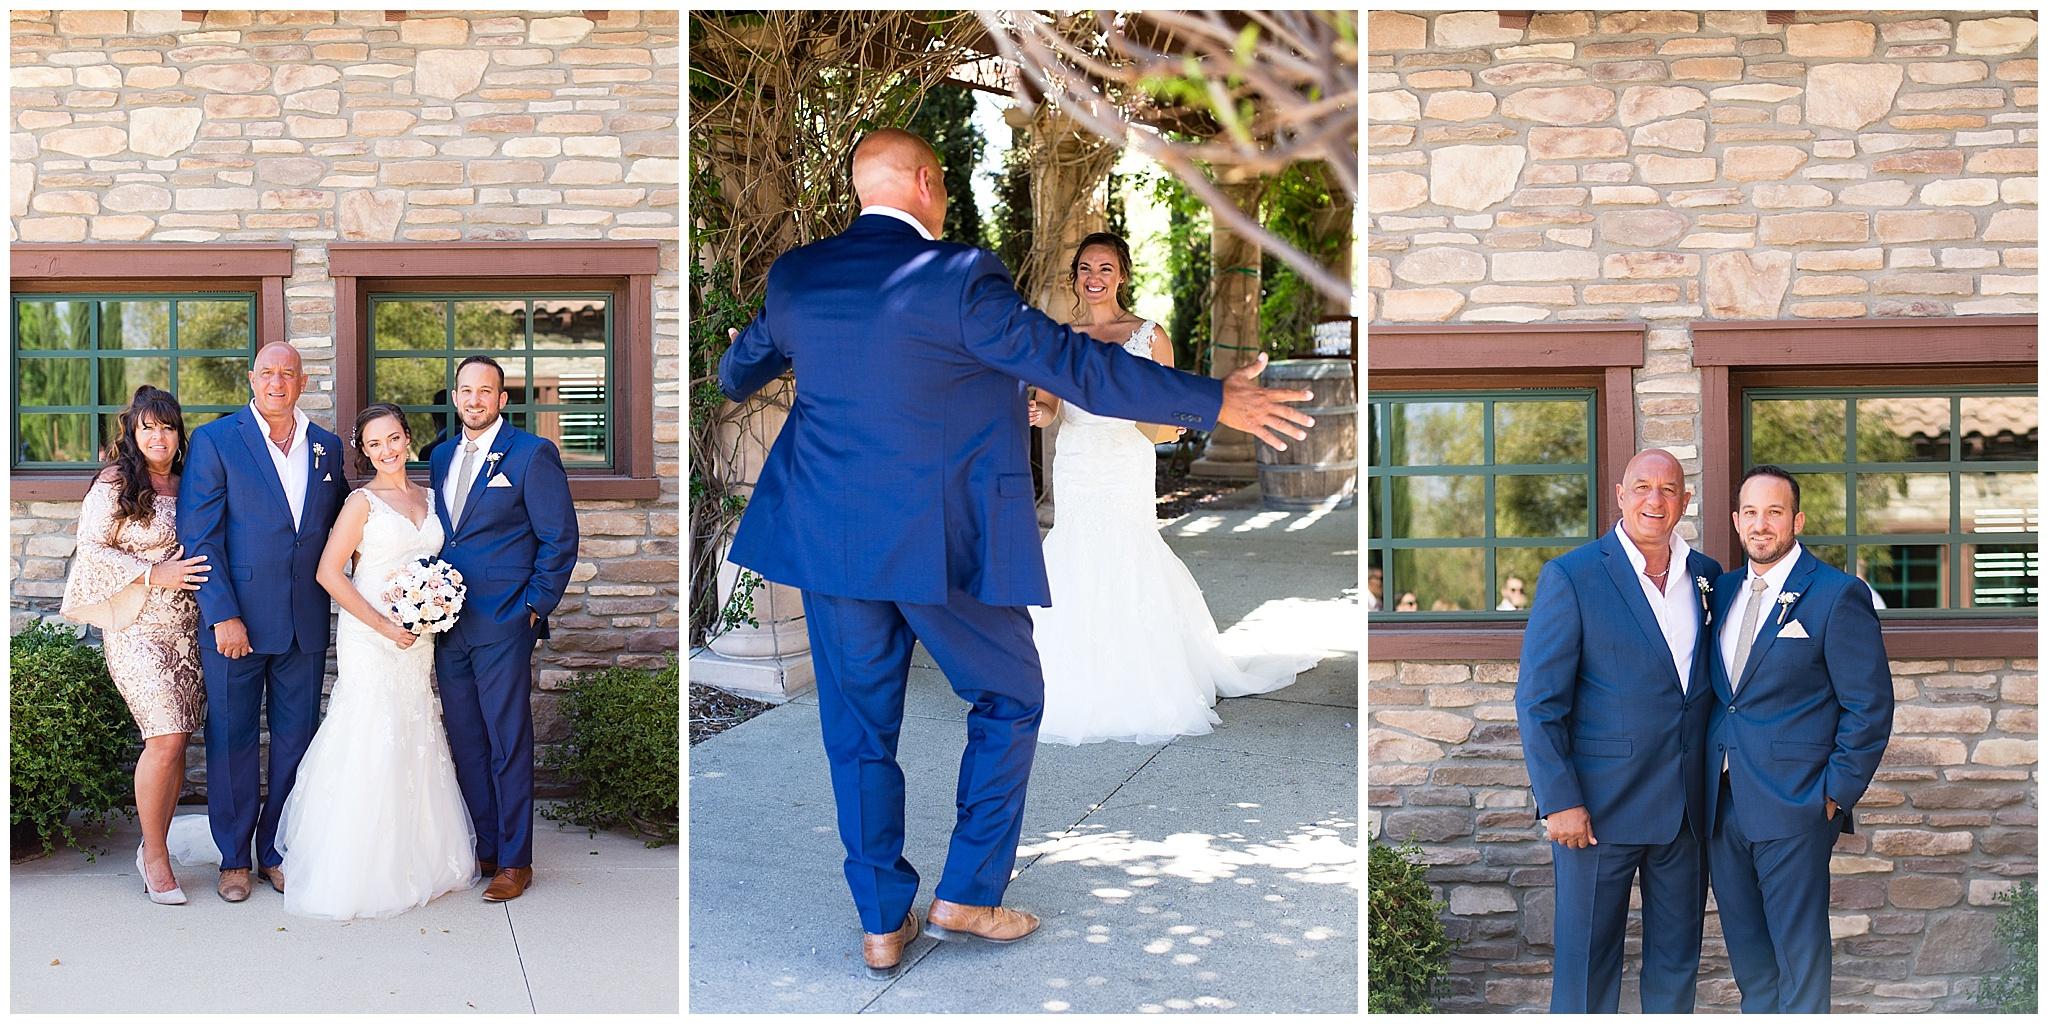 Vinny-Cayt-Wedding-04-26-18-1132.jpg